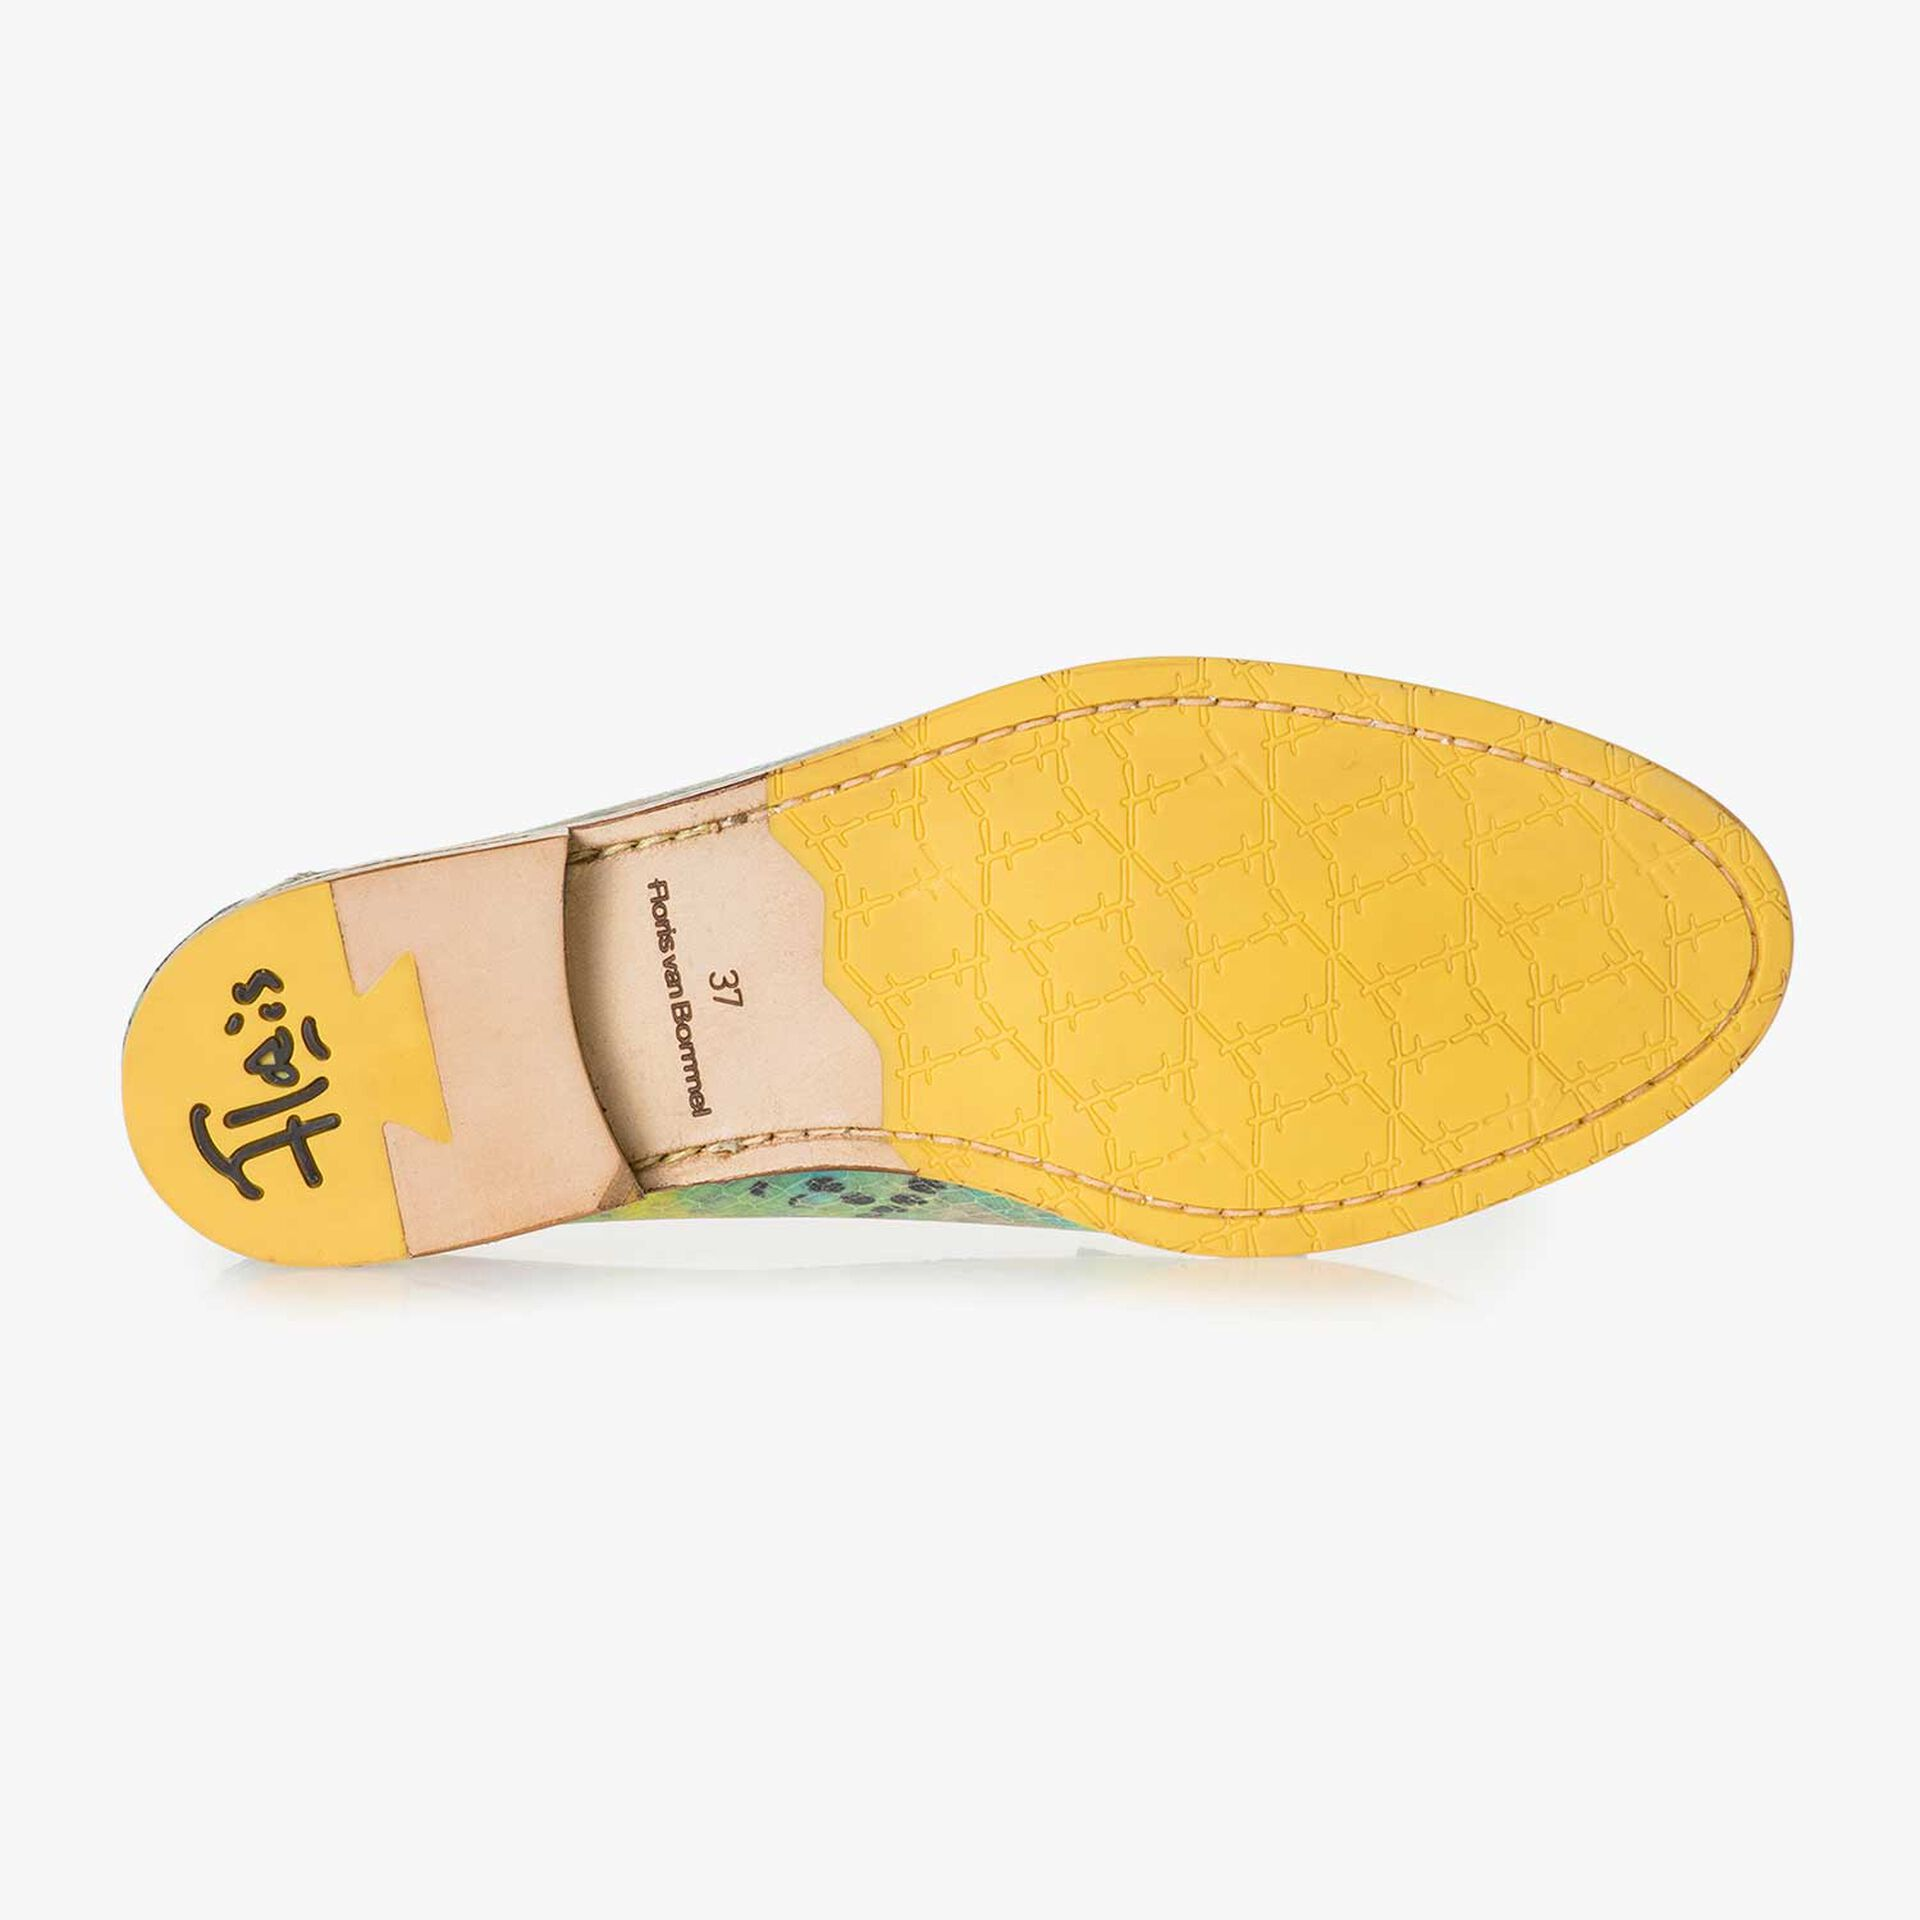 Green snake print leather loafer